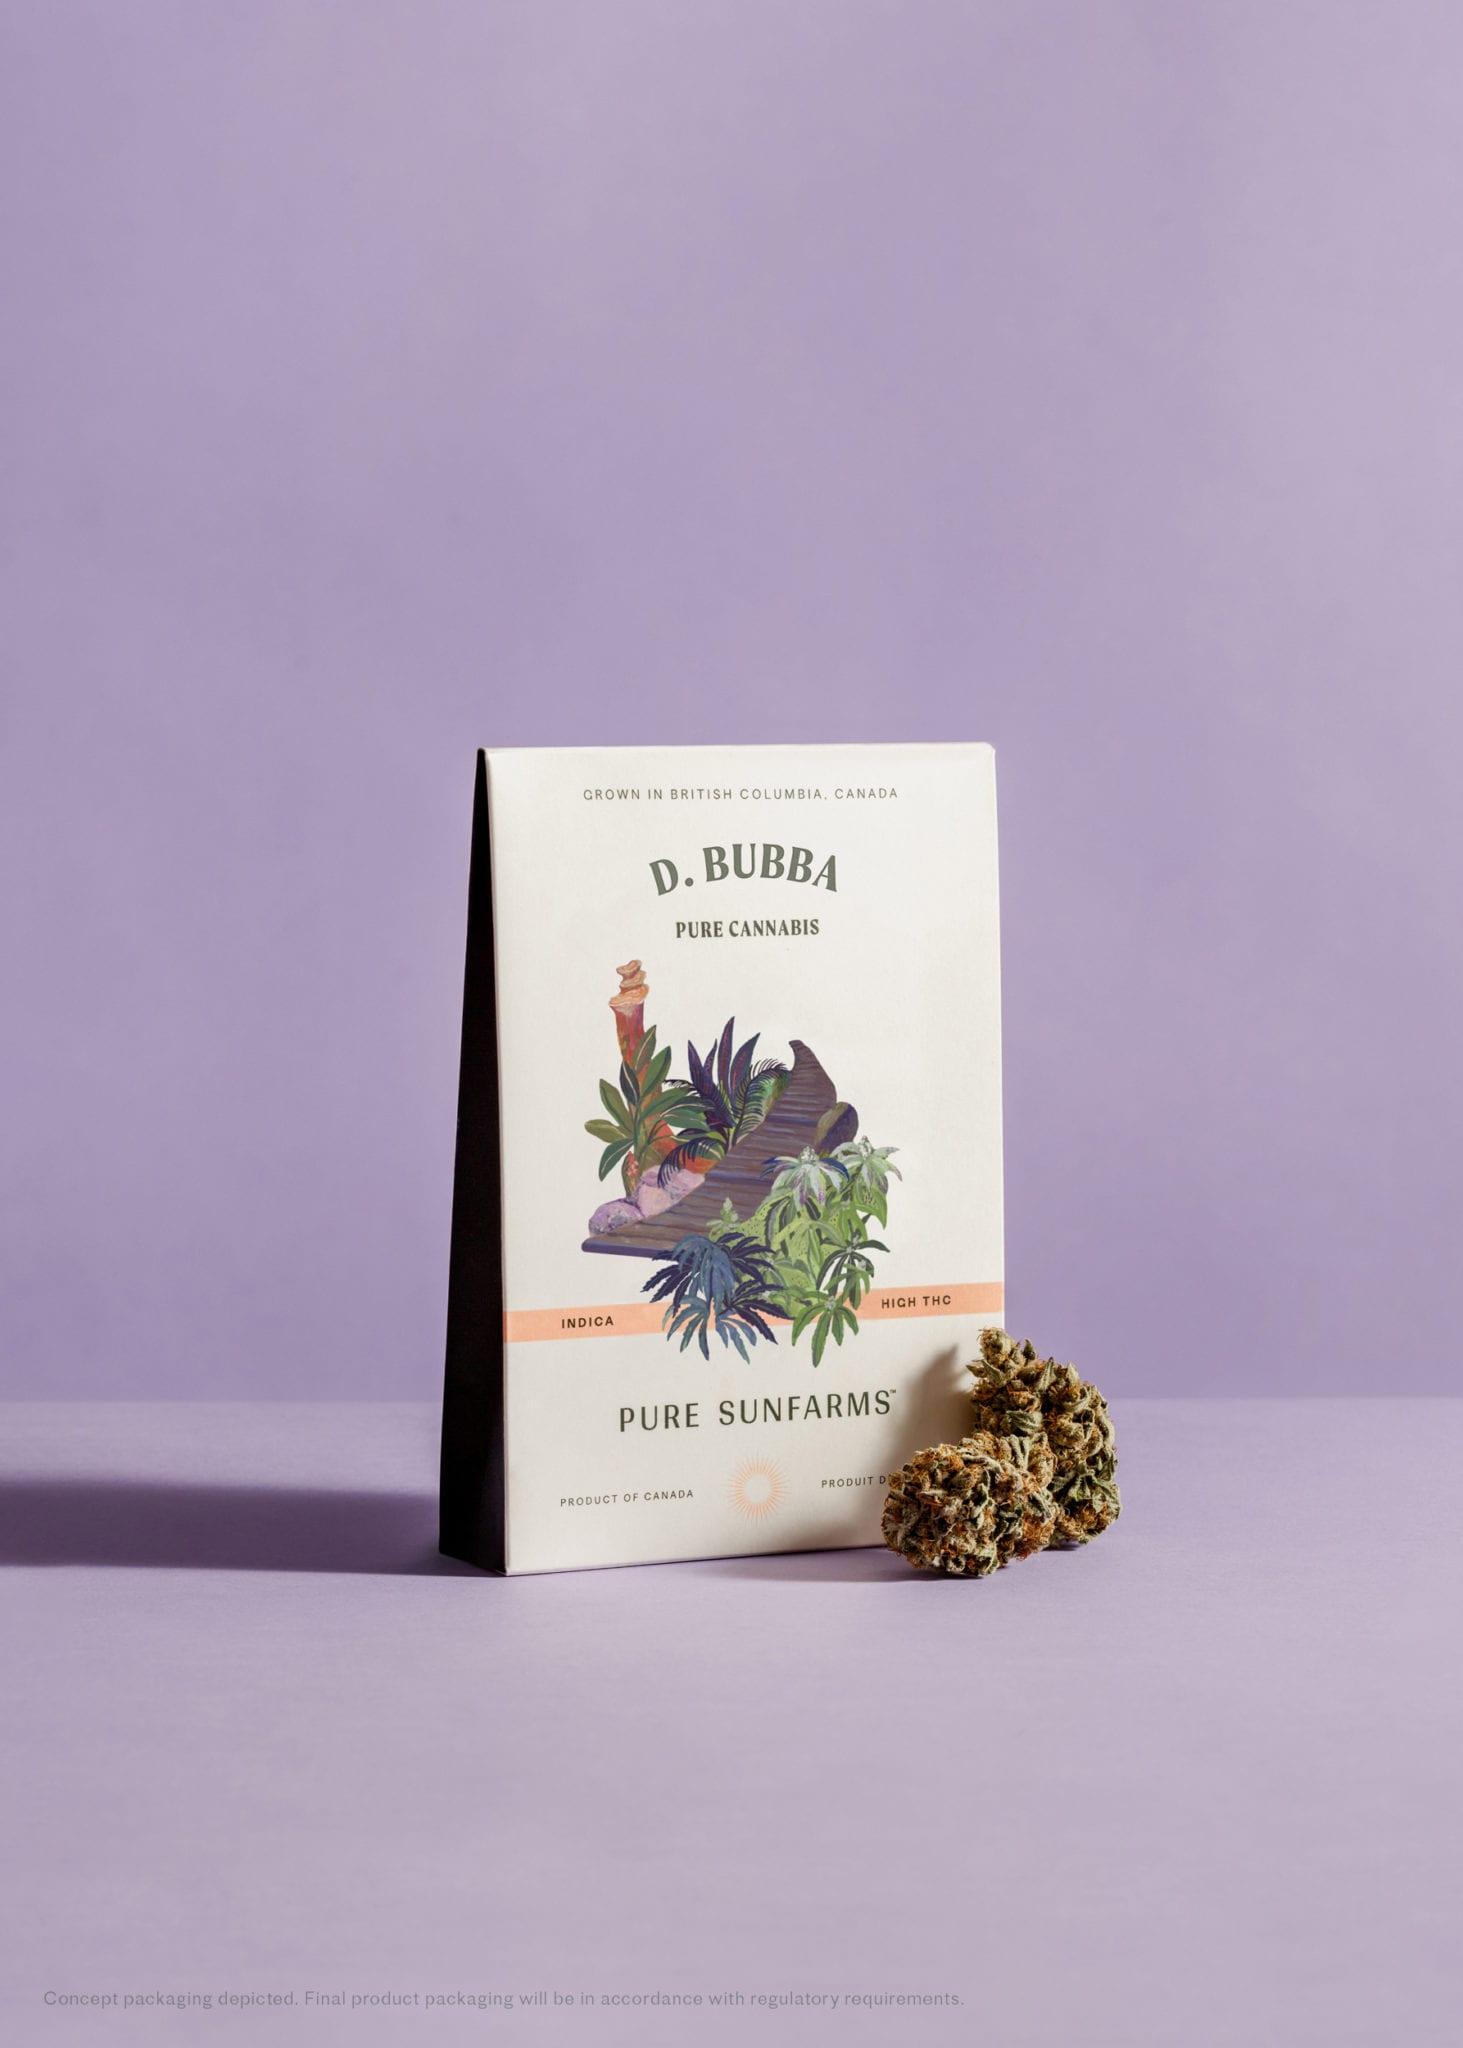 Pure Sunfarms D. Bubba packaging